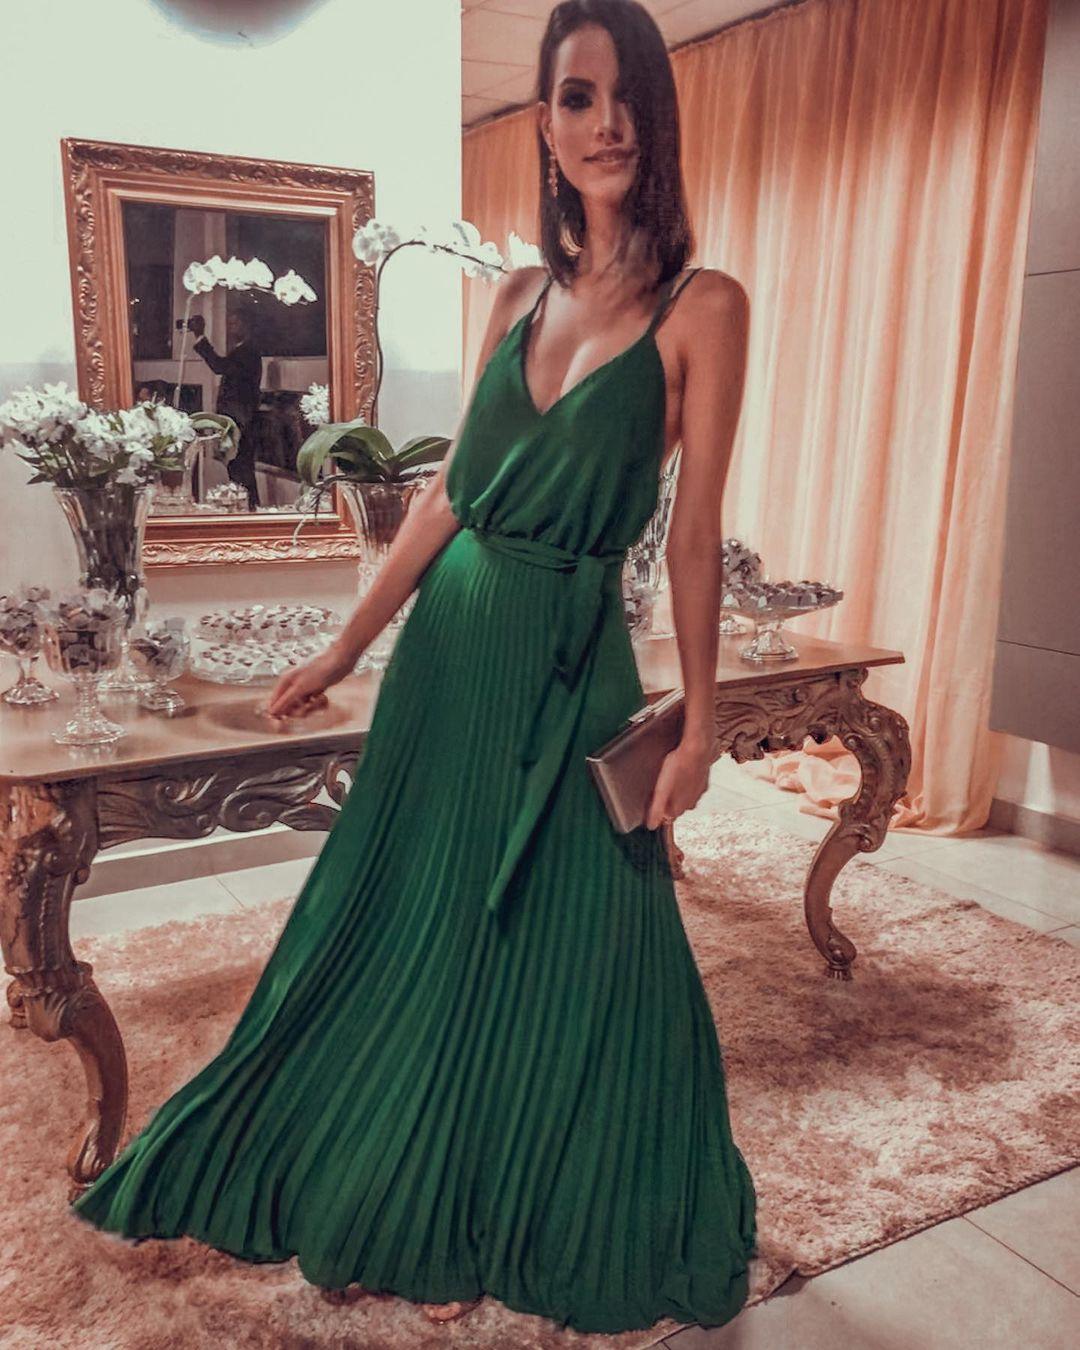 rafaella felipe, top 20 de miss brasil mundo 2019. - Página 4 97965810